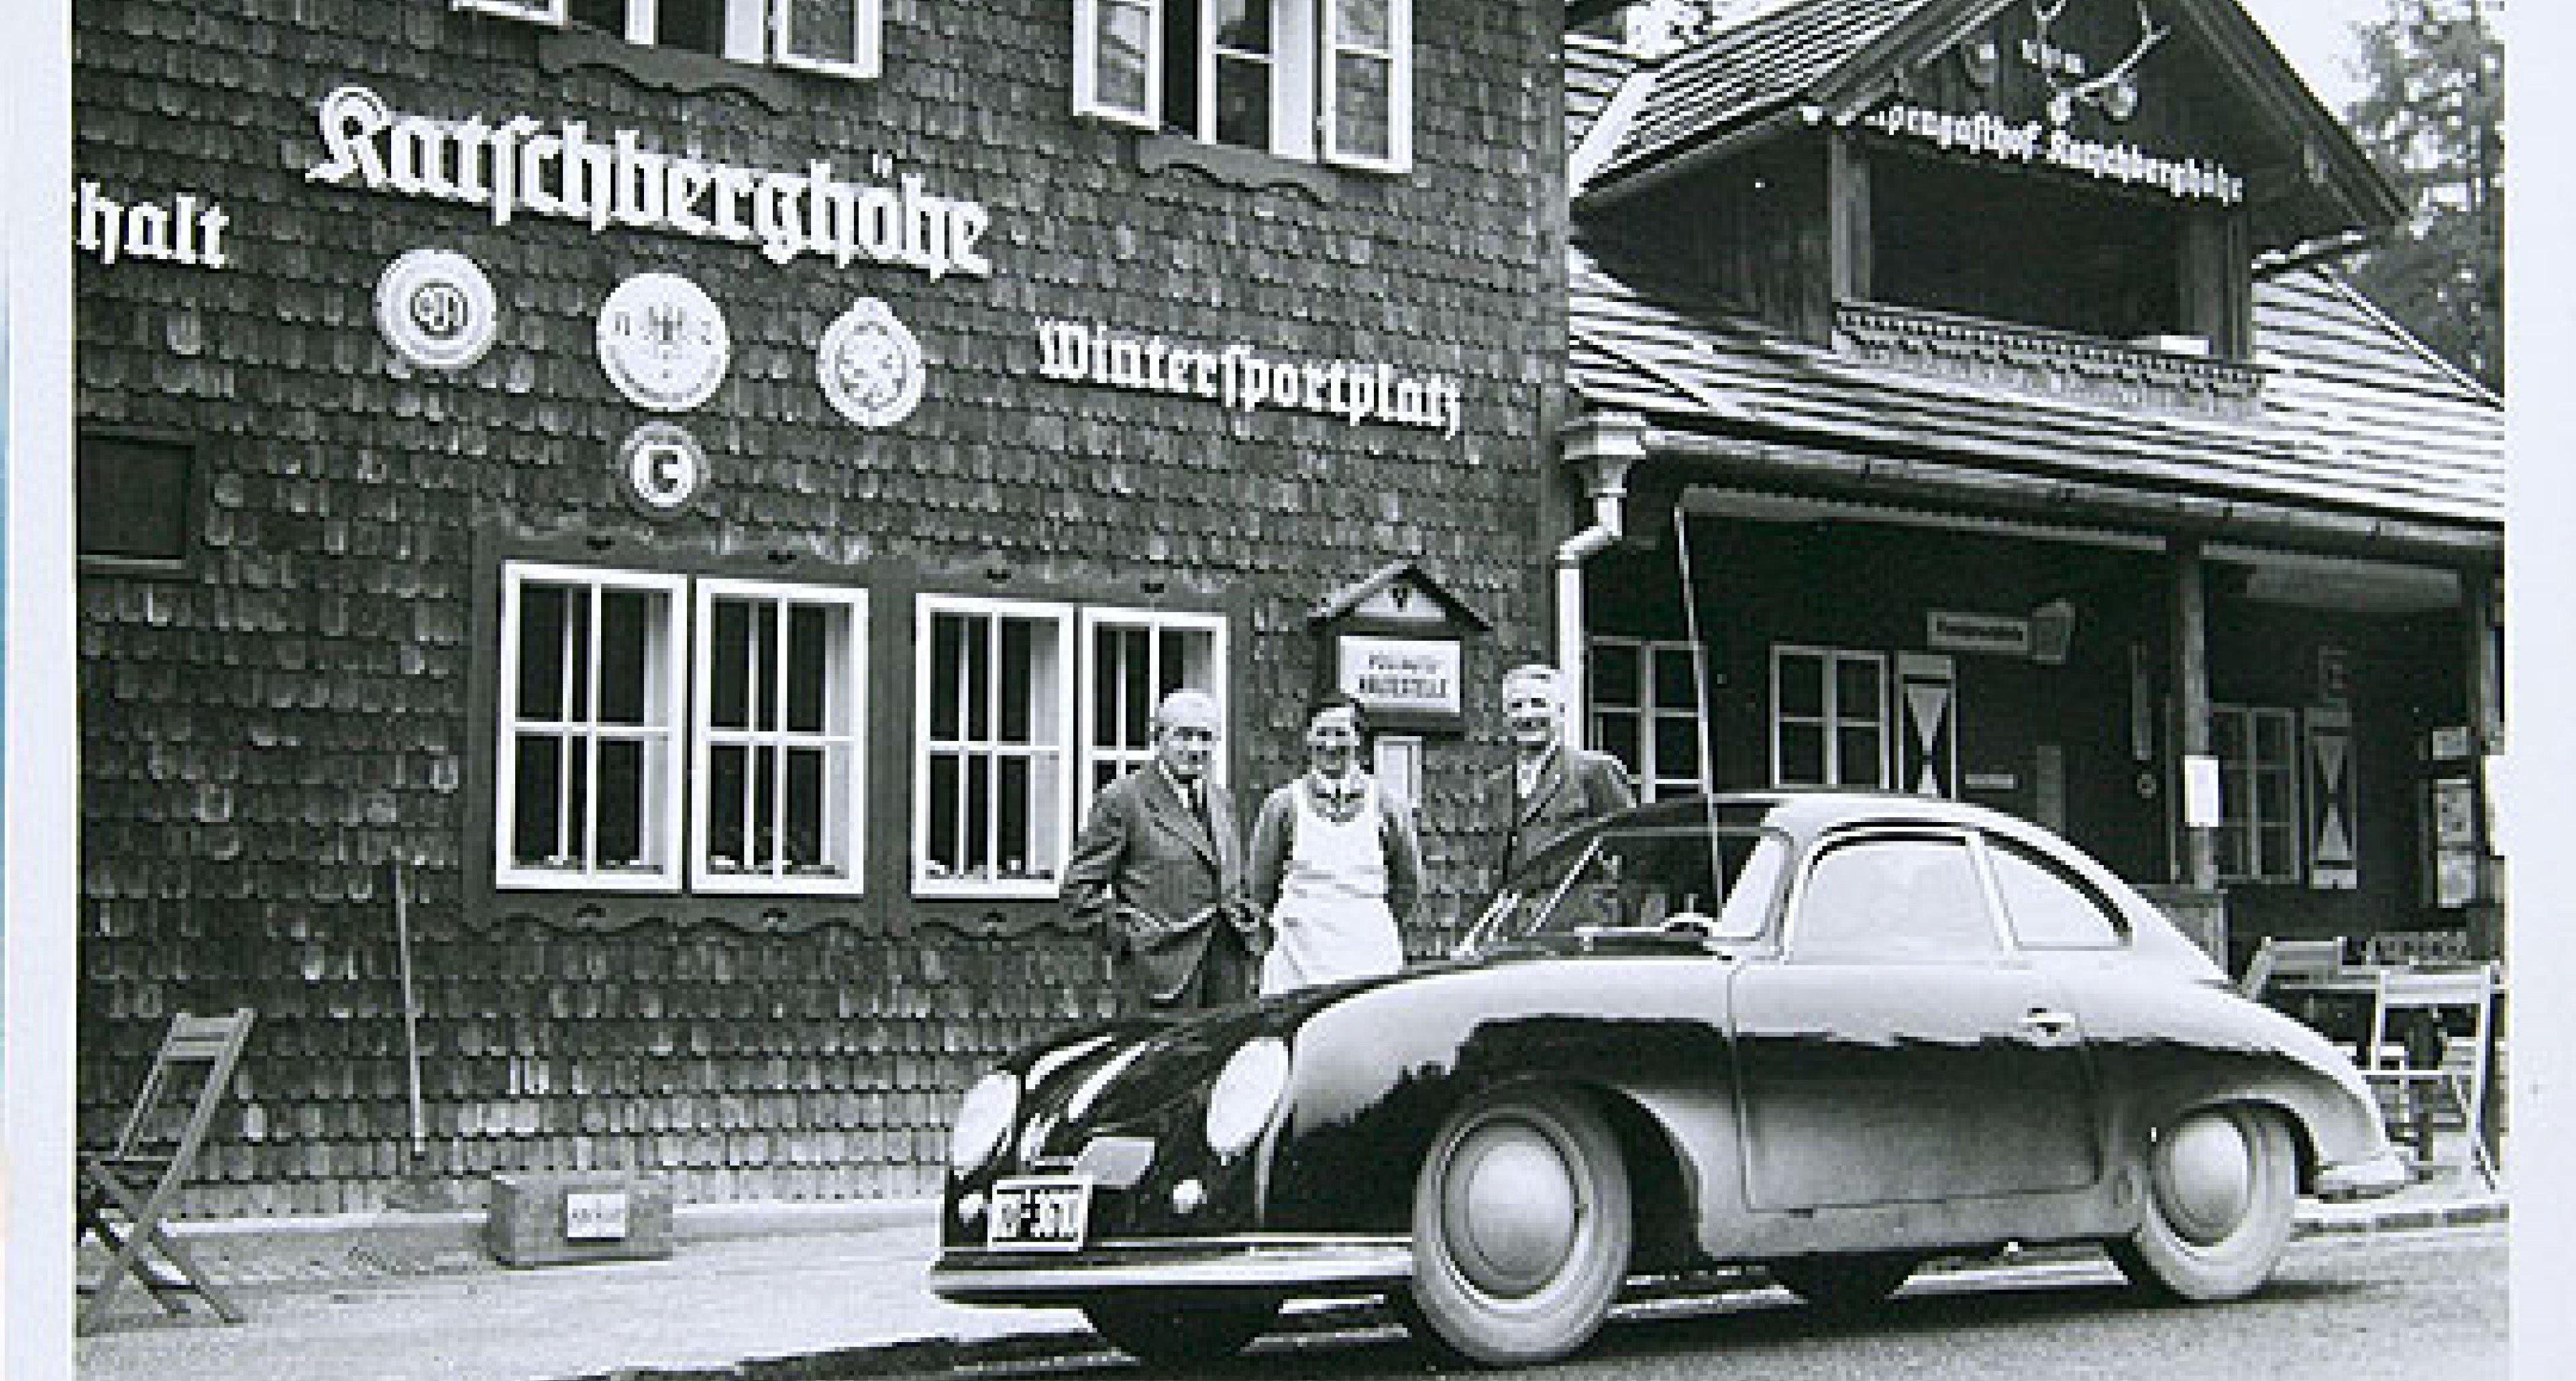 Seidel Automobilia Auktion Ladenburg 2007 - Vorschau